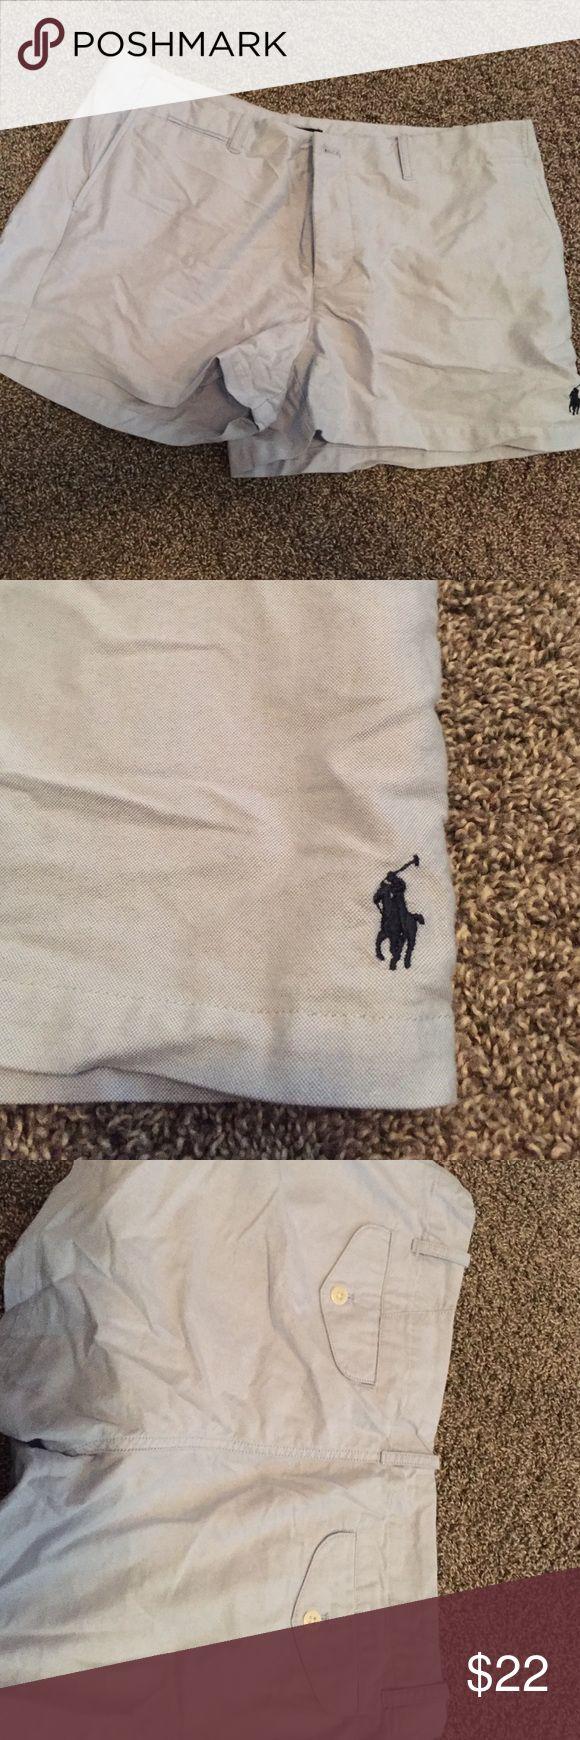 Women's Polo Shorts. NWOT NWOT. Ralph Lauren Light Blue Shorts. size 12. Polo by Ralph Lauren Shorts